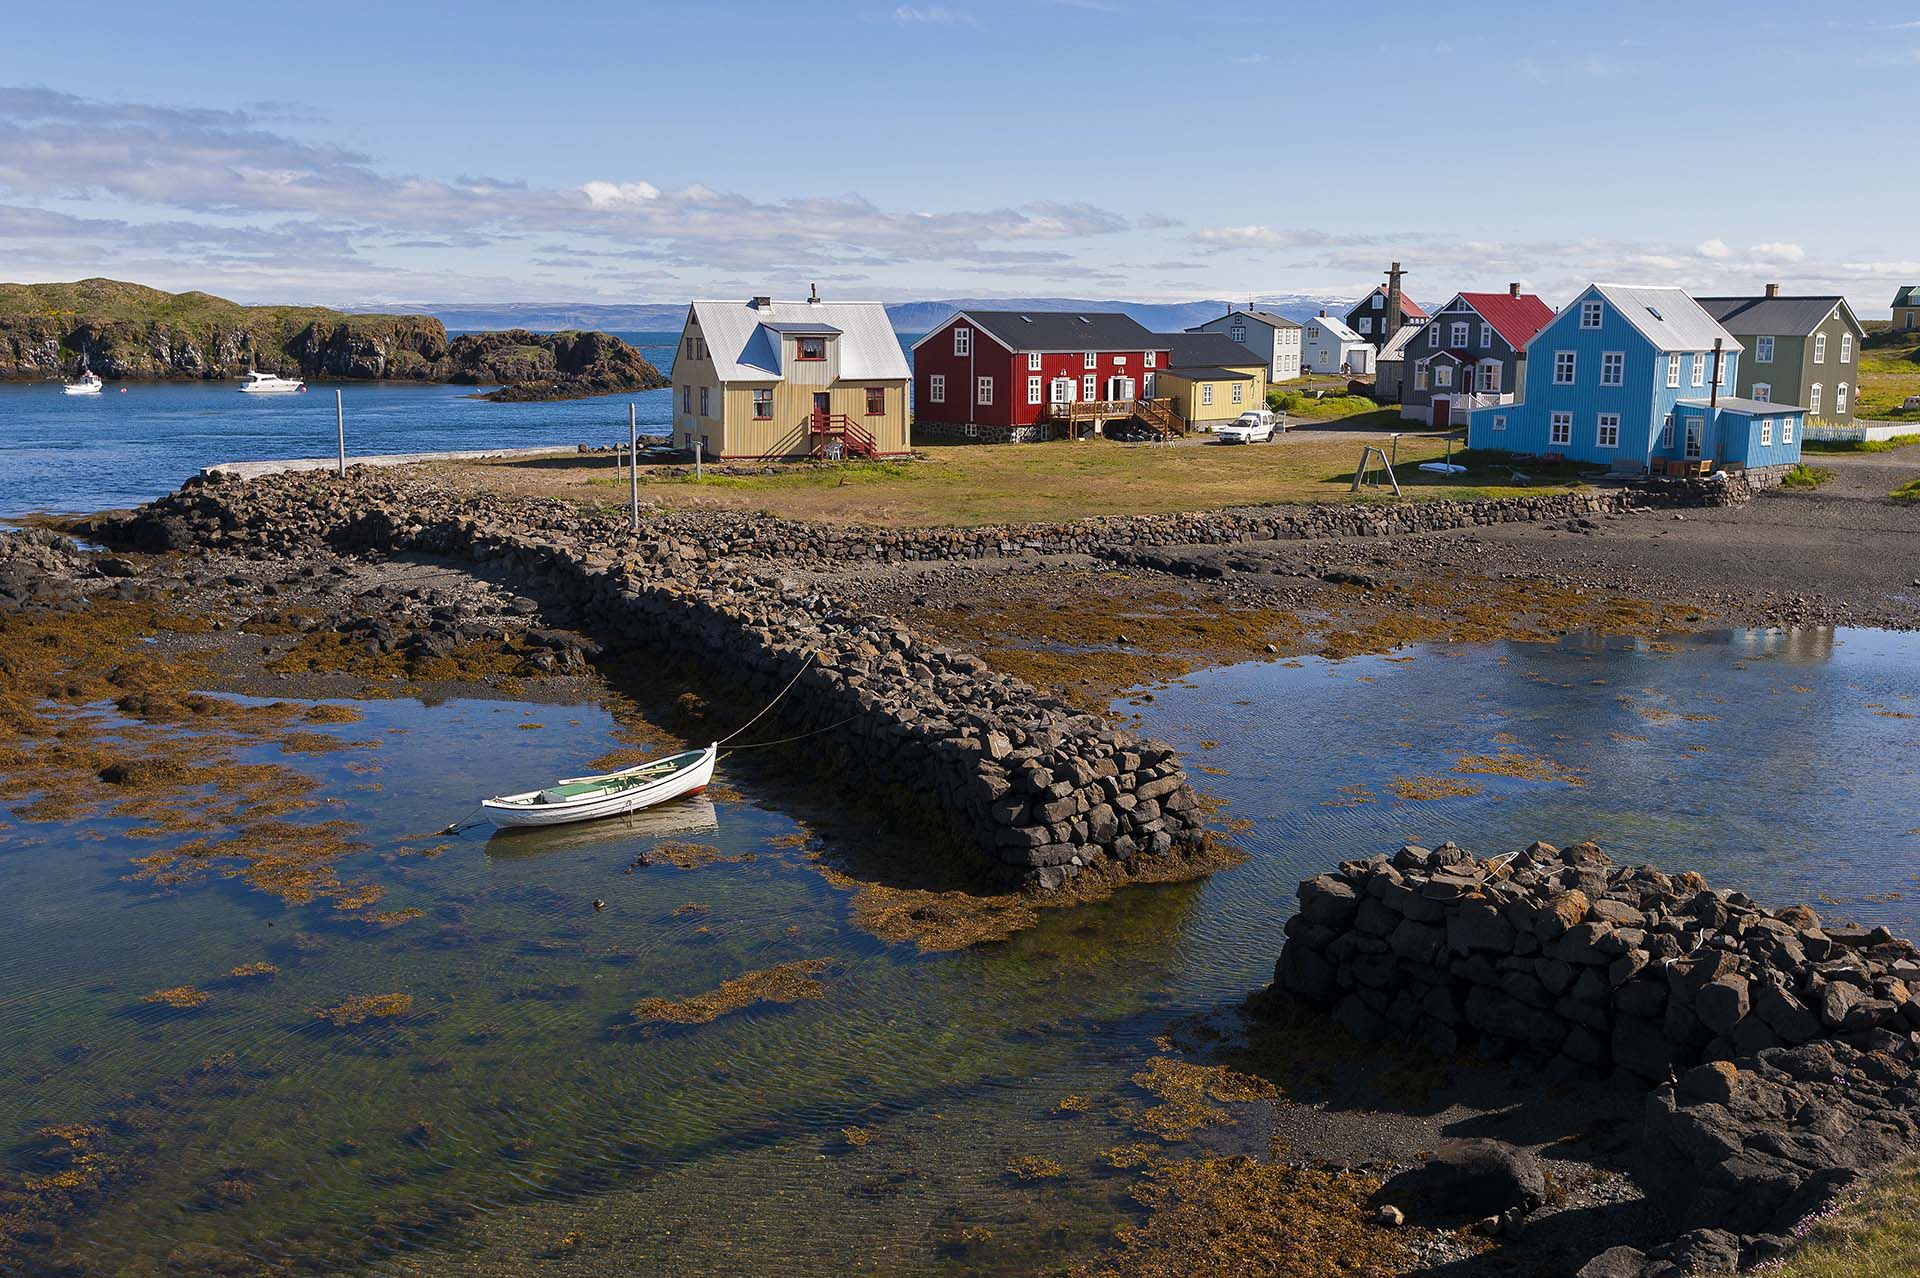 Mandatory Credit: Photo by Patrick Frilet/Shutterstock (3404257gh) Flatey island, Breidafjordur, Iceland Iceland - Jun 2012